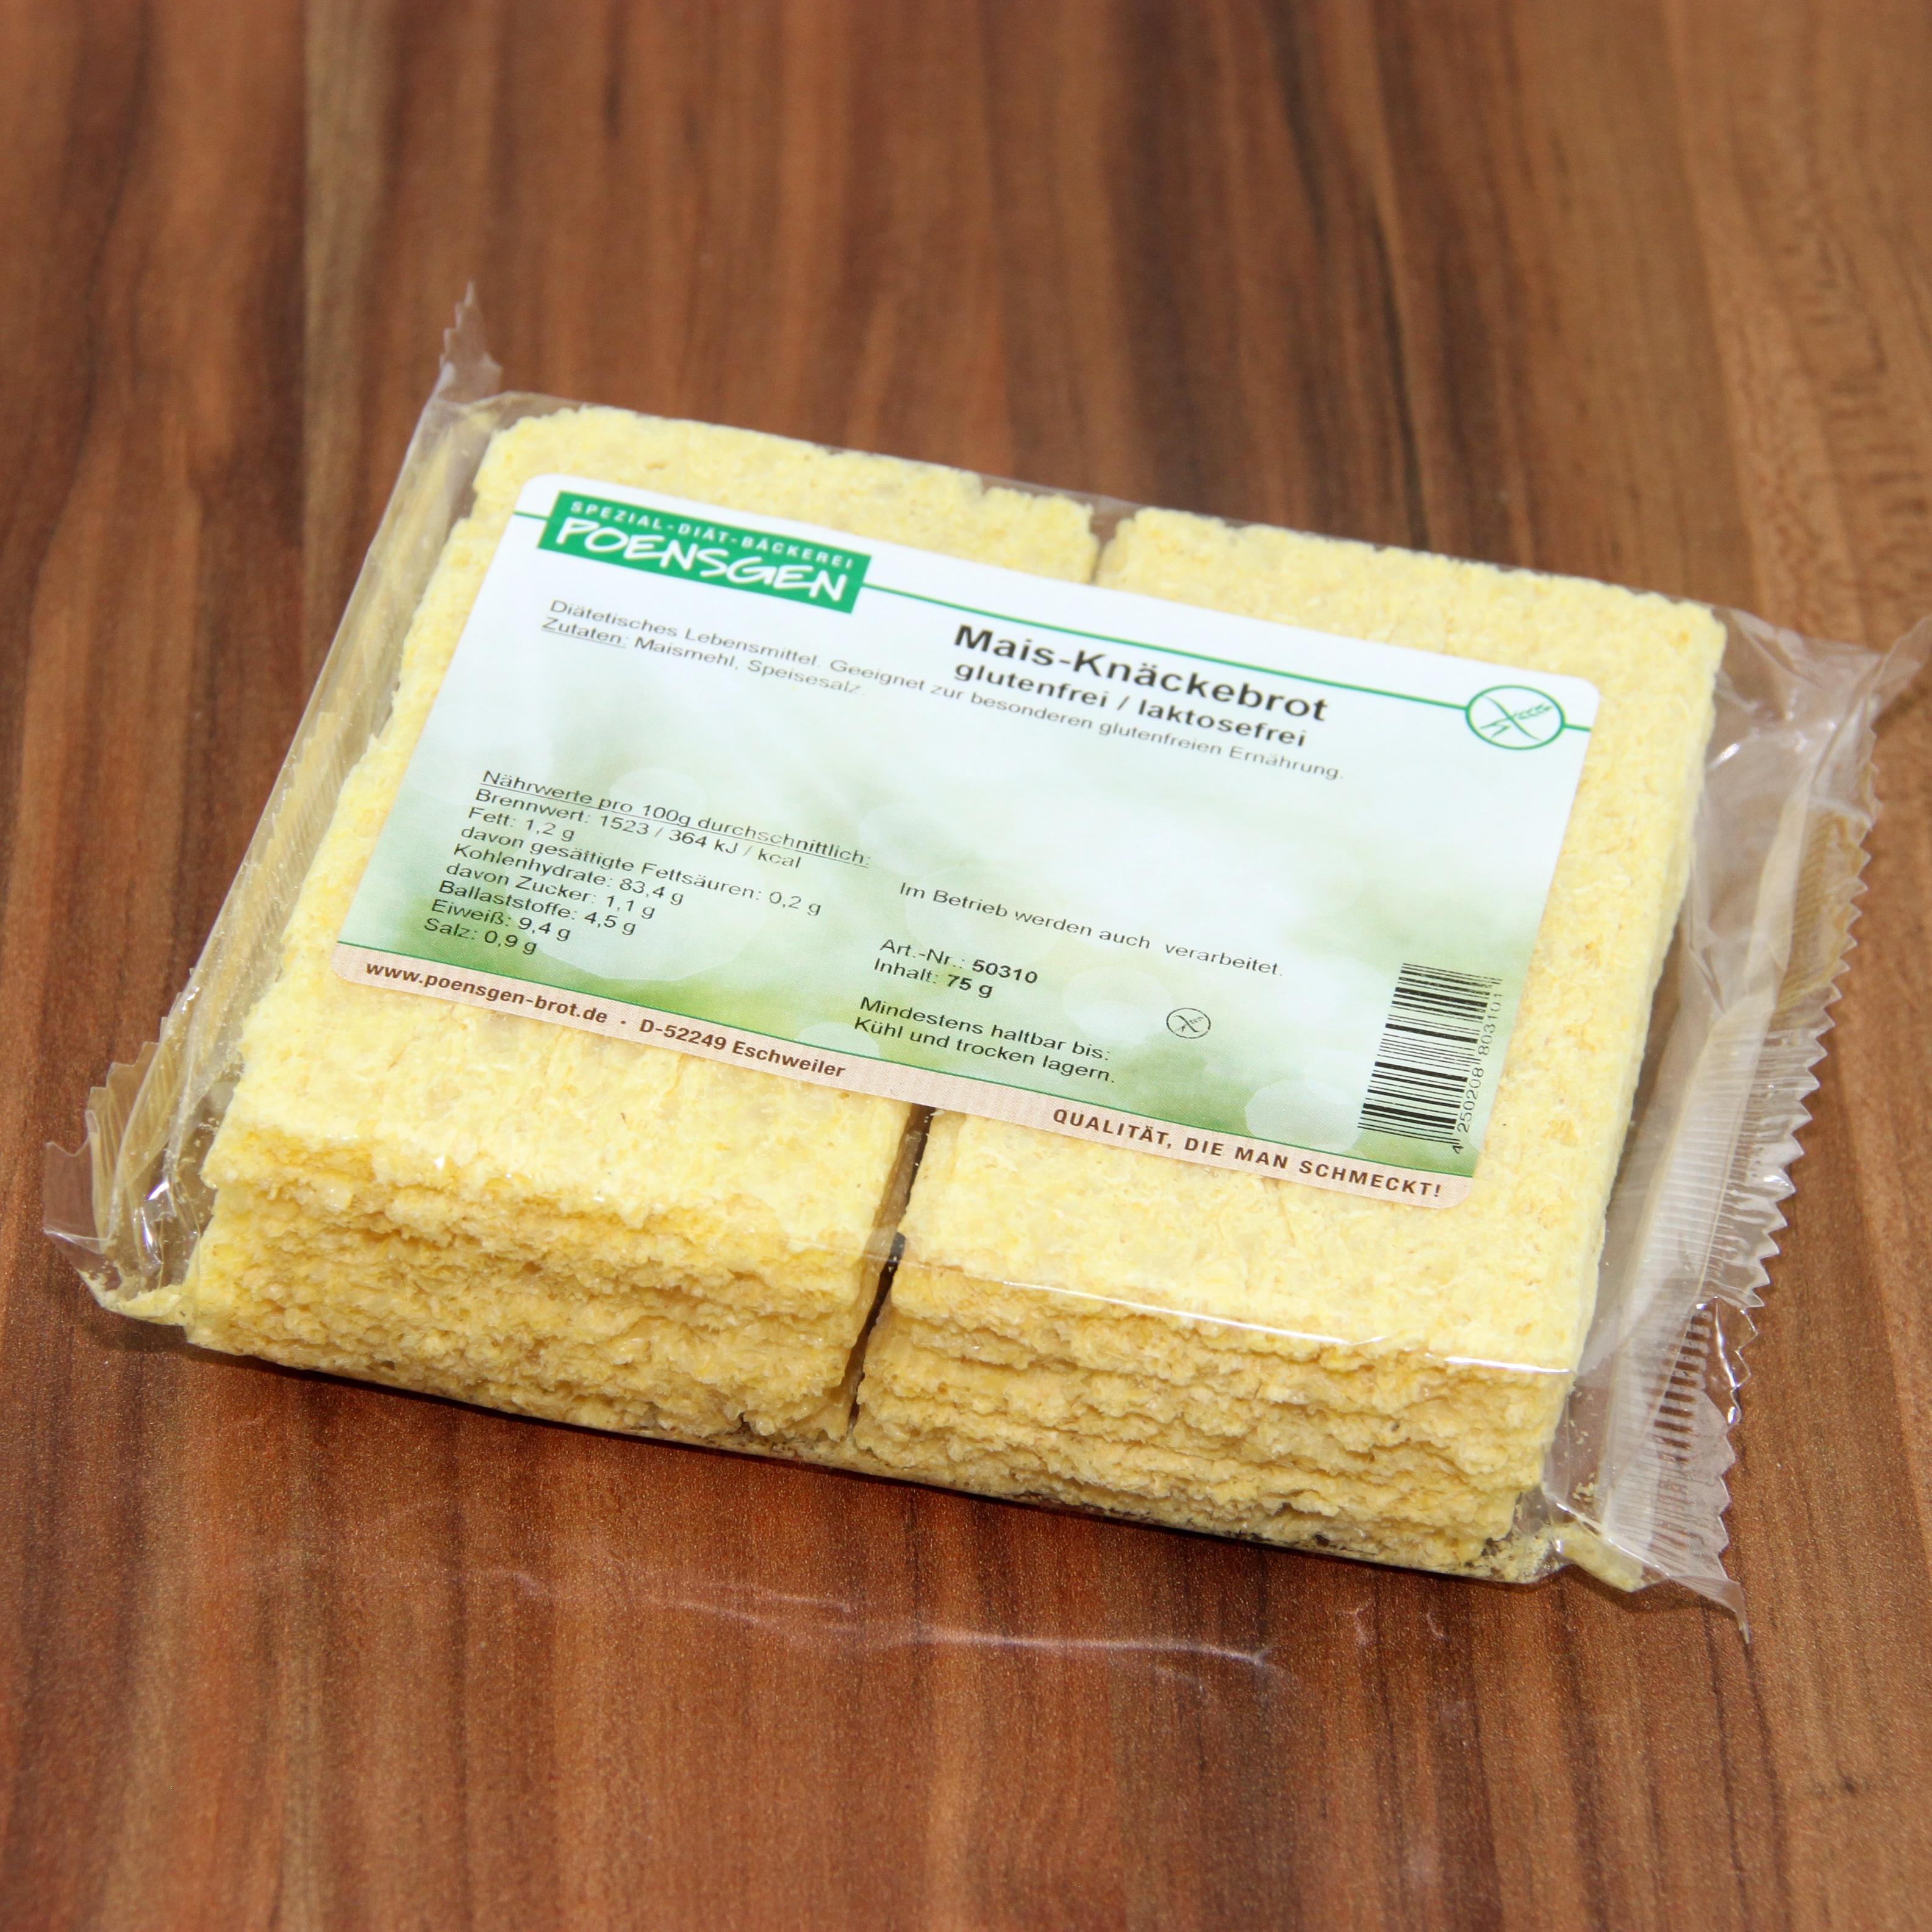 Poensgen Mais Knäckebrot Glutenfrei 75g